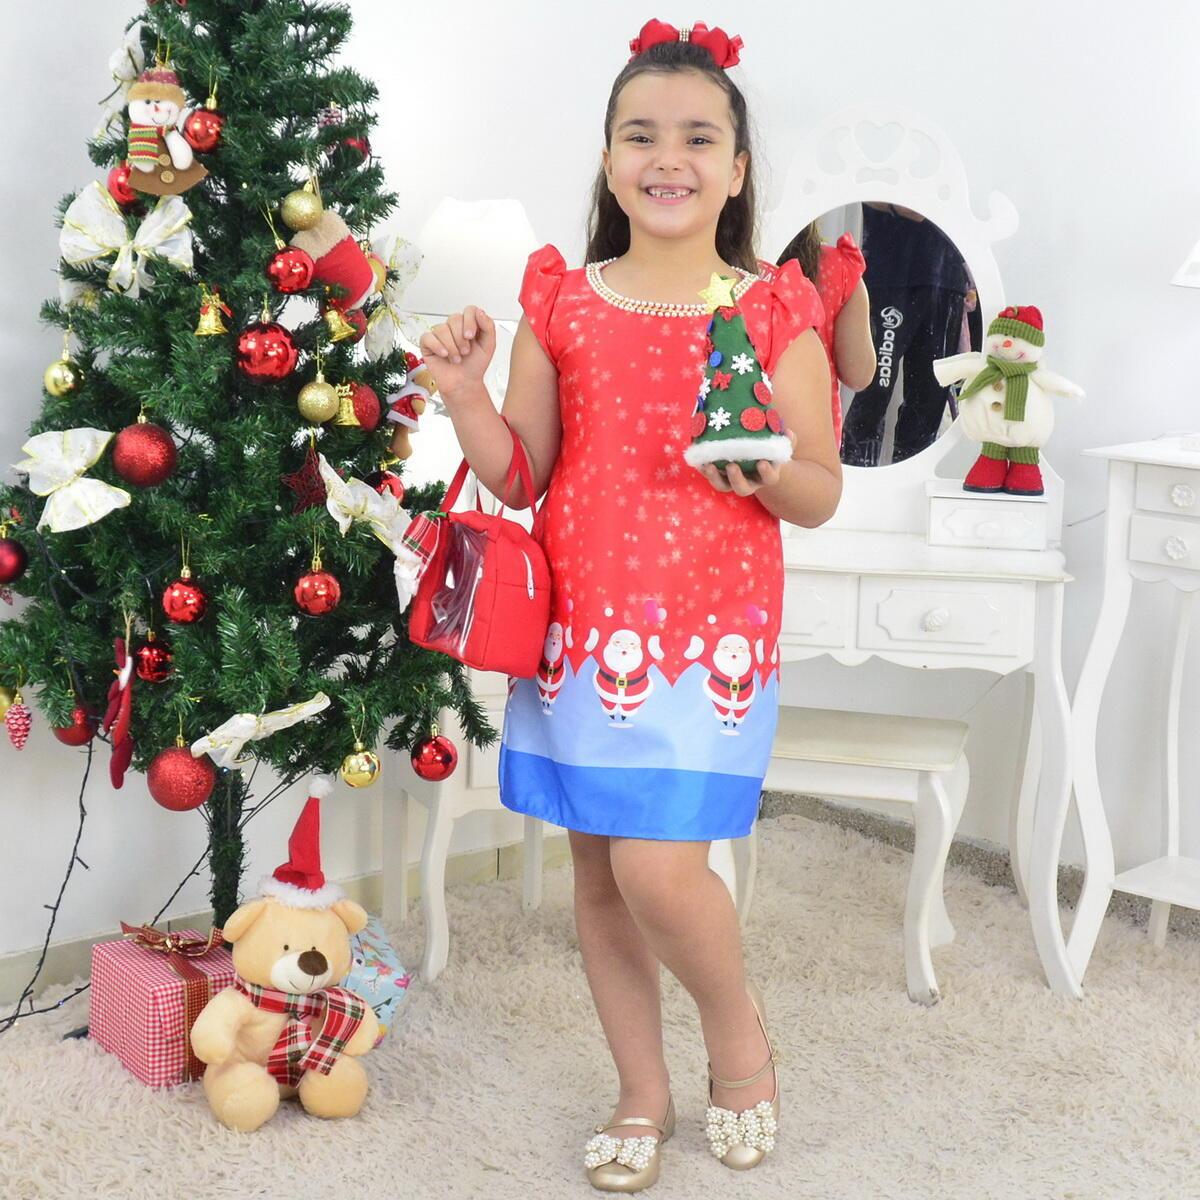 Vestido Infantil Papai Noel Natal Com Bolsa e Arvore de Montar